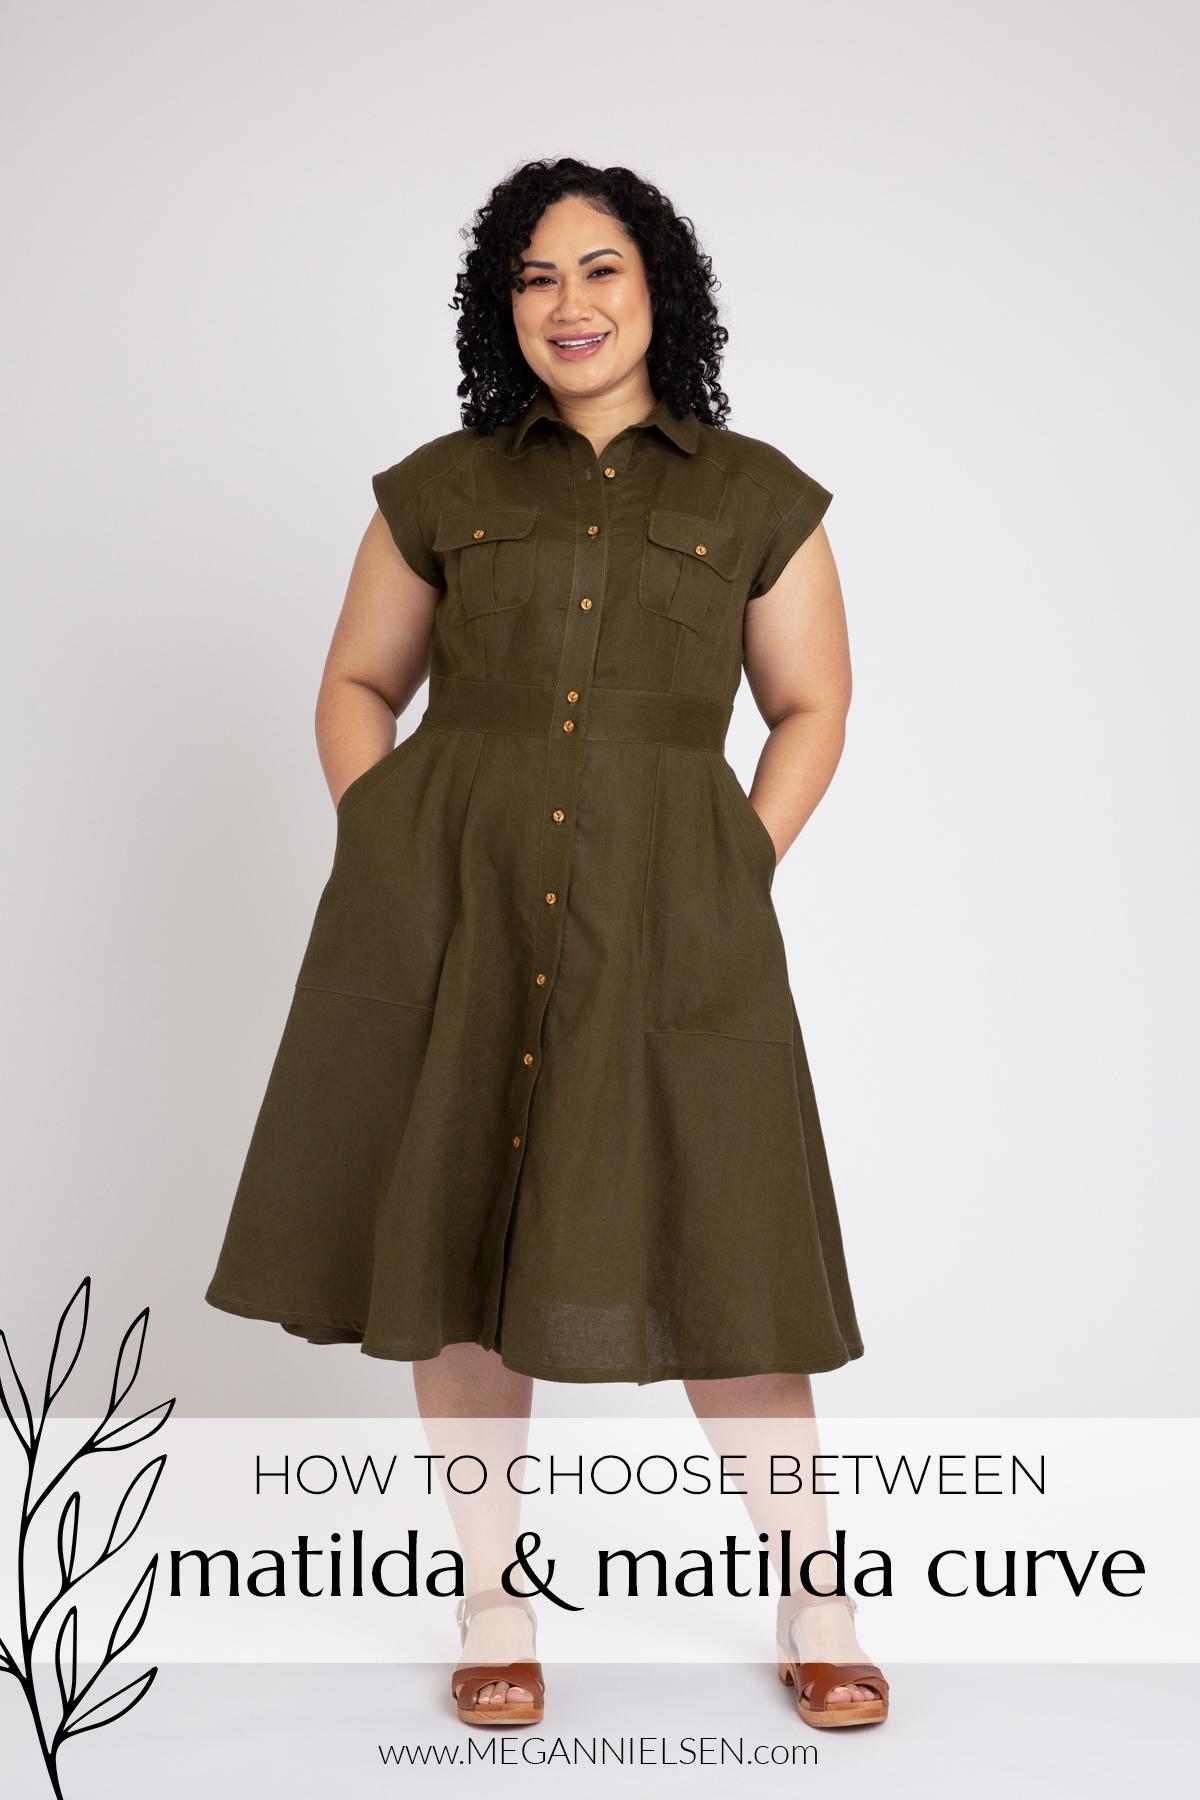 How to Choose Between the Matilda & Matilda Curve Sewing Pattern | Megan Nielsen Blog